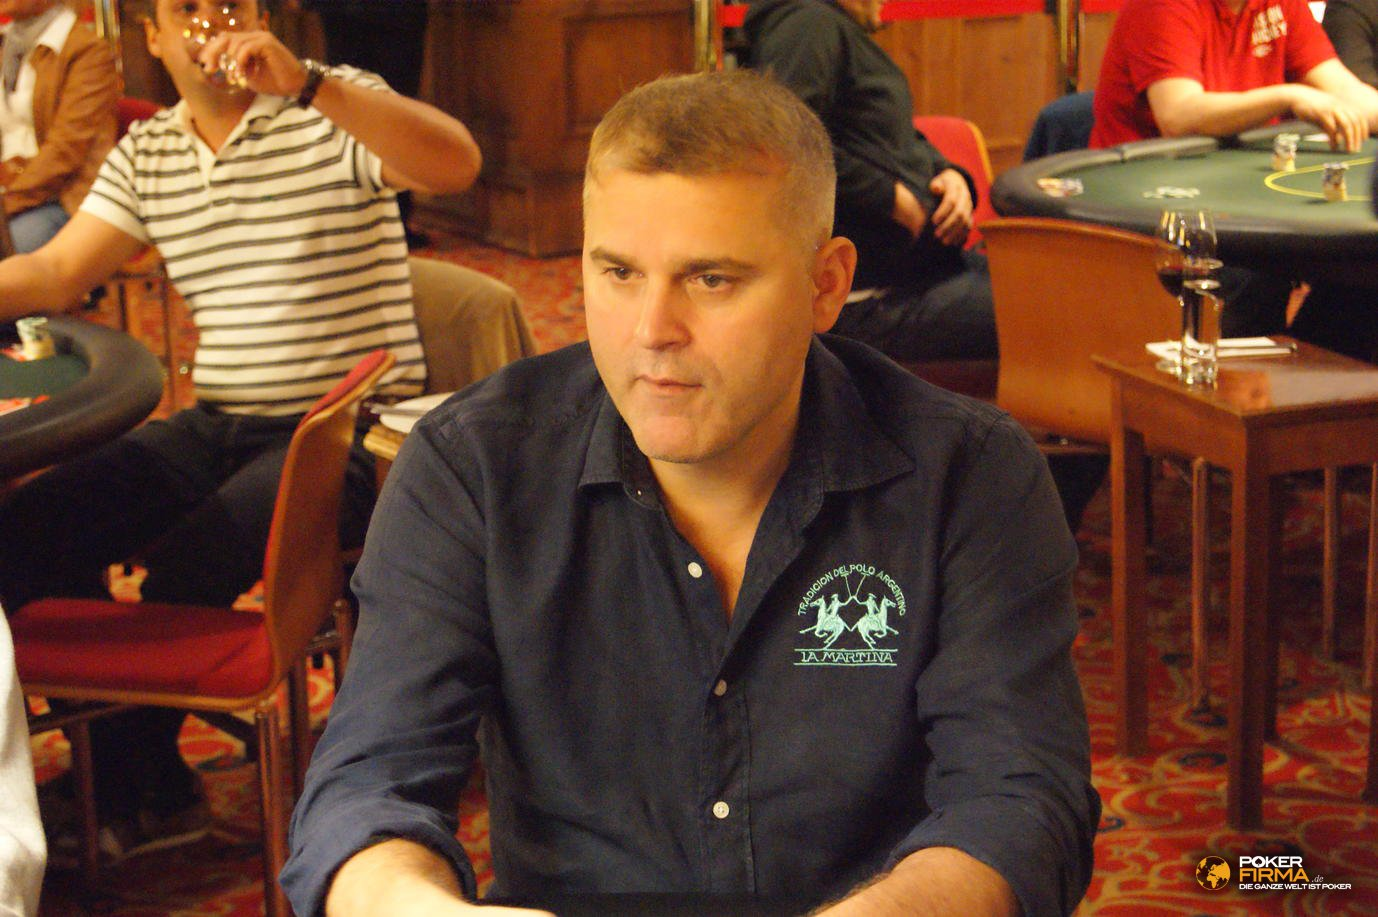 Mountain_Poker_Party_250_NLH_051011_Marijan_Tadic